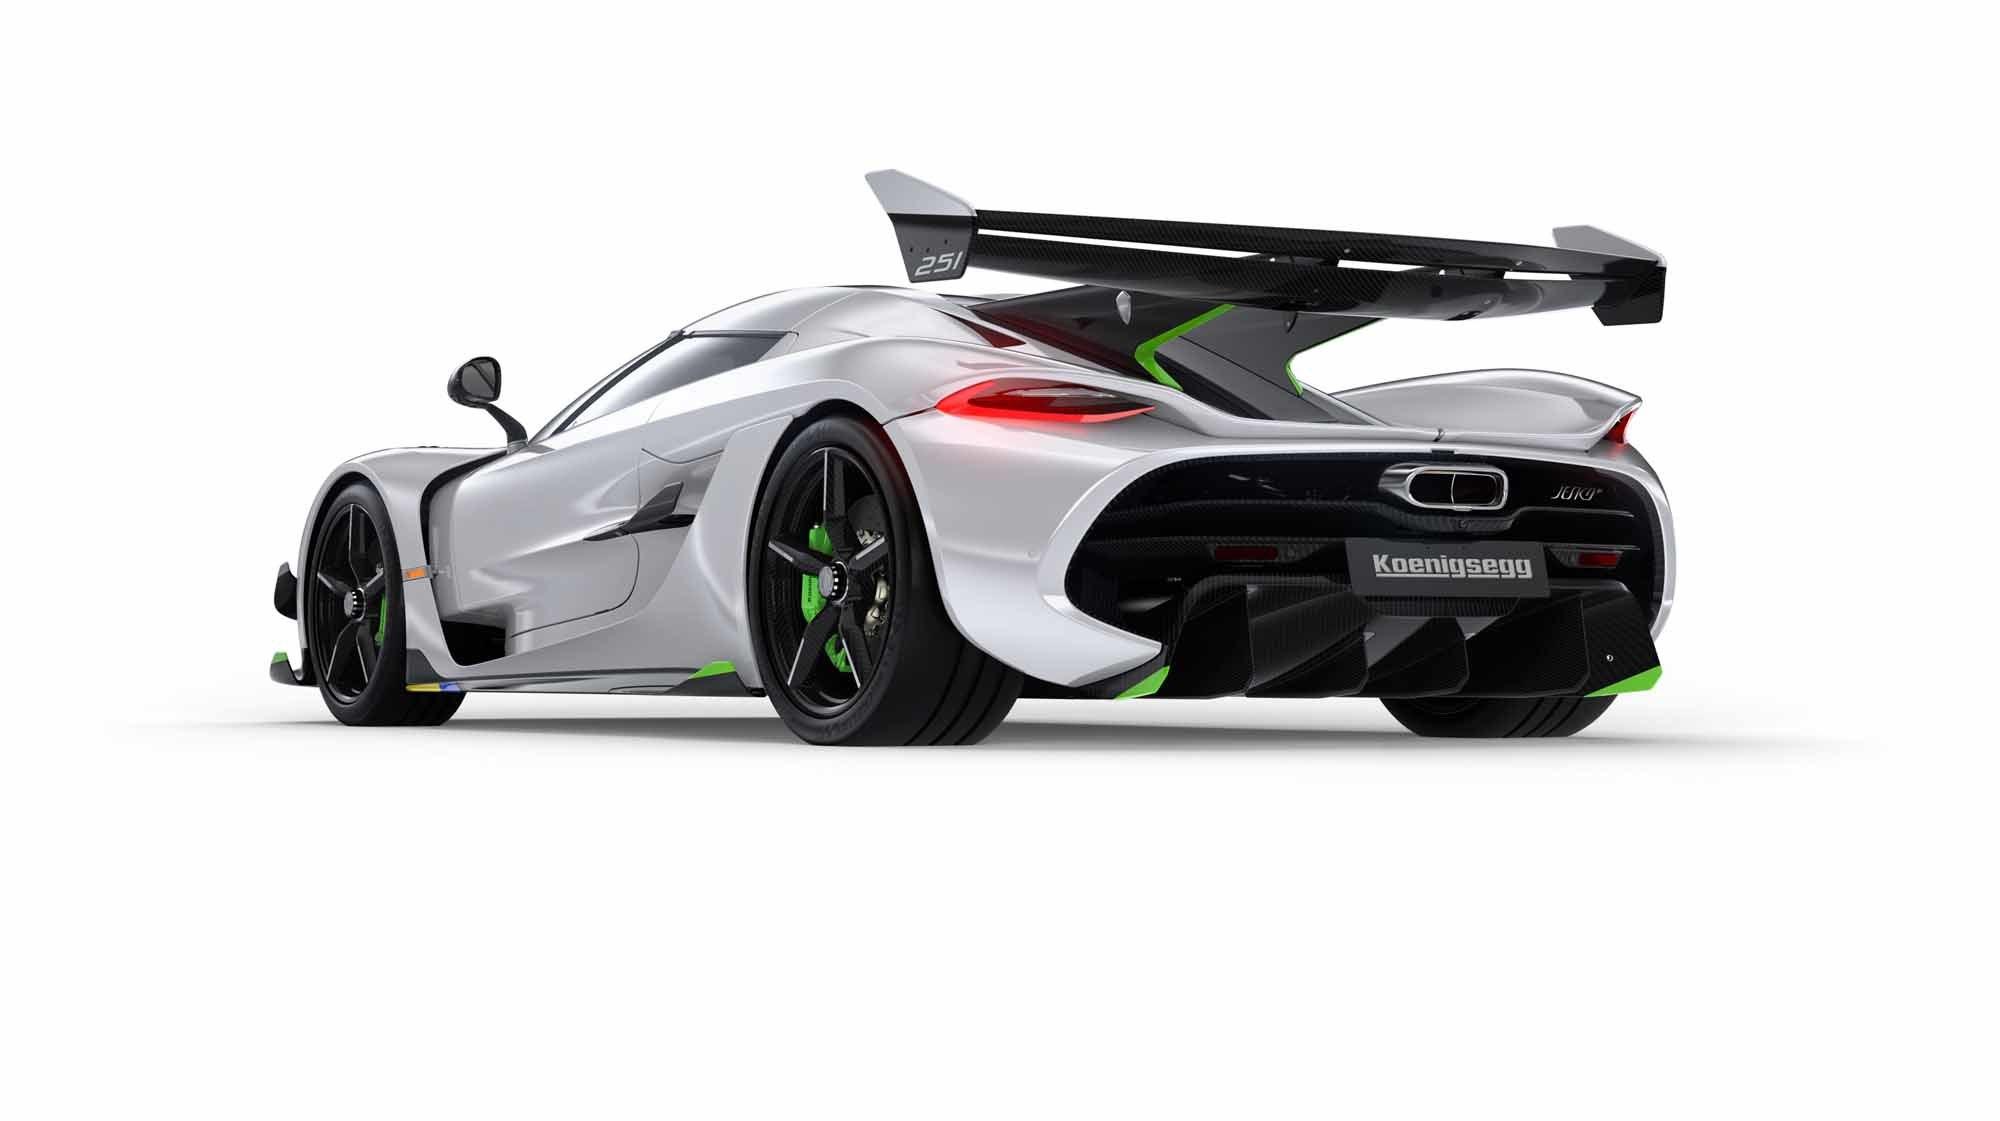 C:\Users\Jialing\Desktop\20190403\20190403\639-Car Guide\Koenigsegg Jesko - half\5c80b363ec05c47562000089.jpg